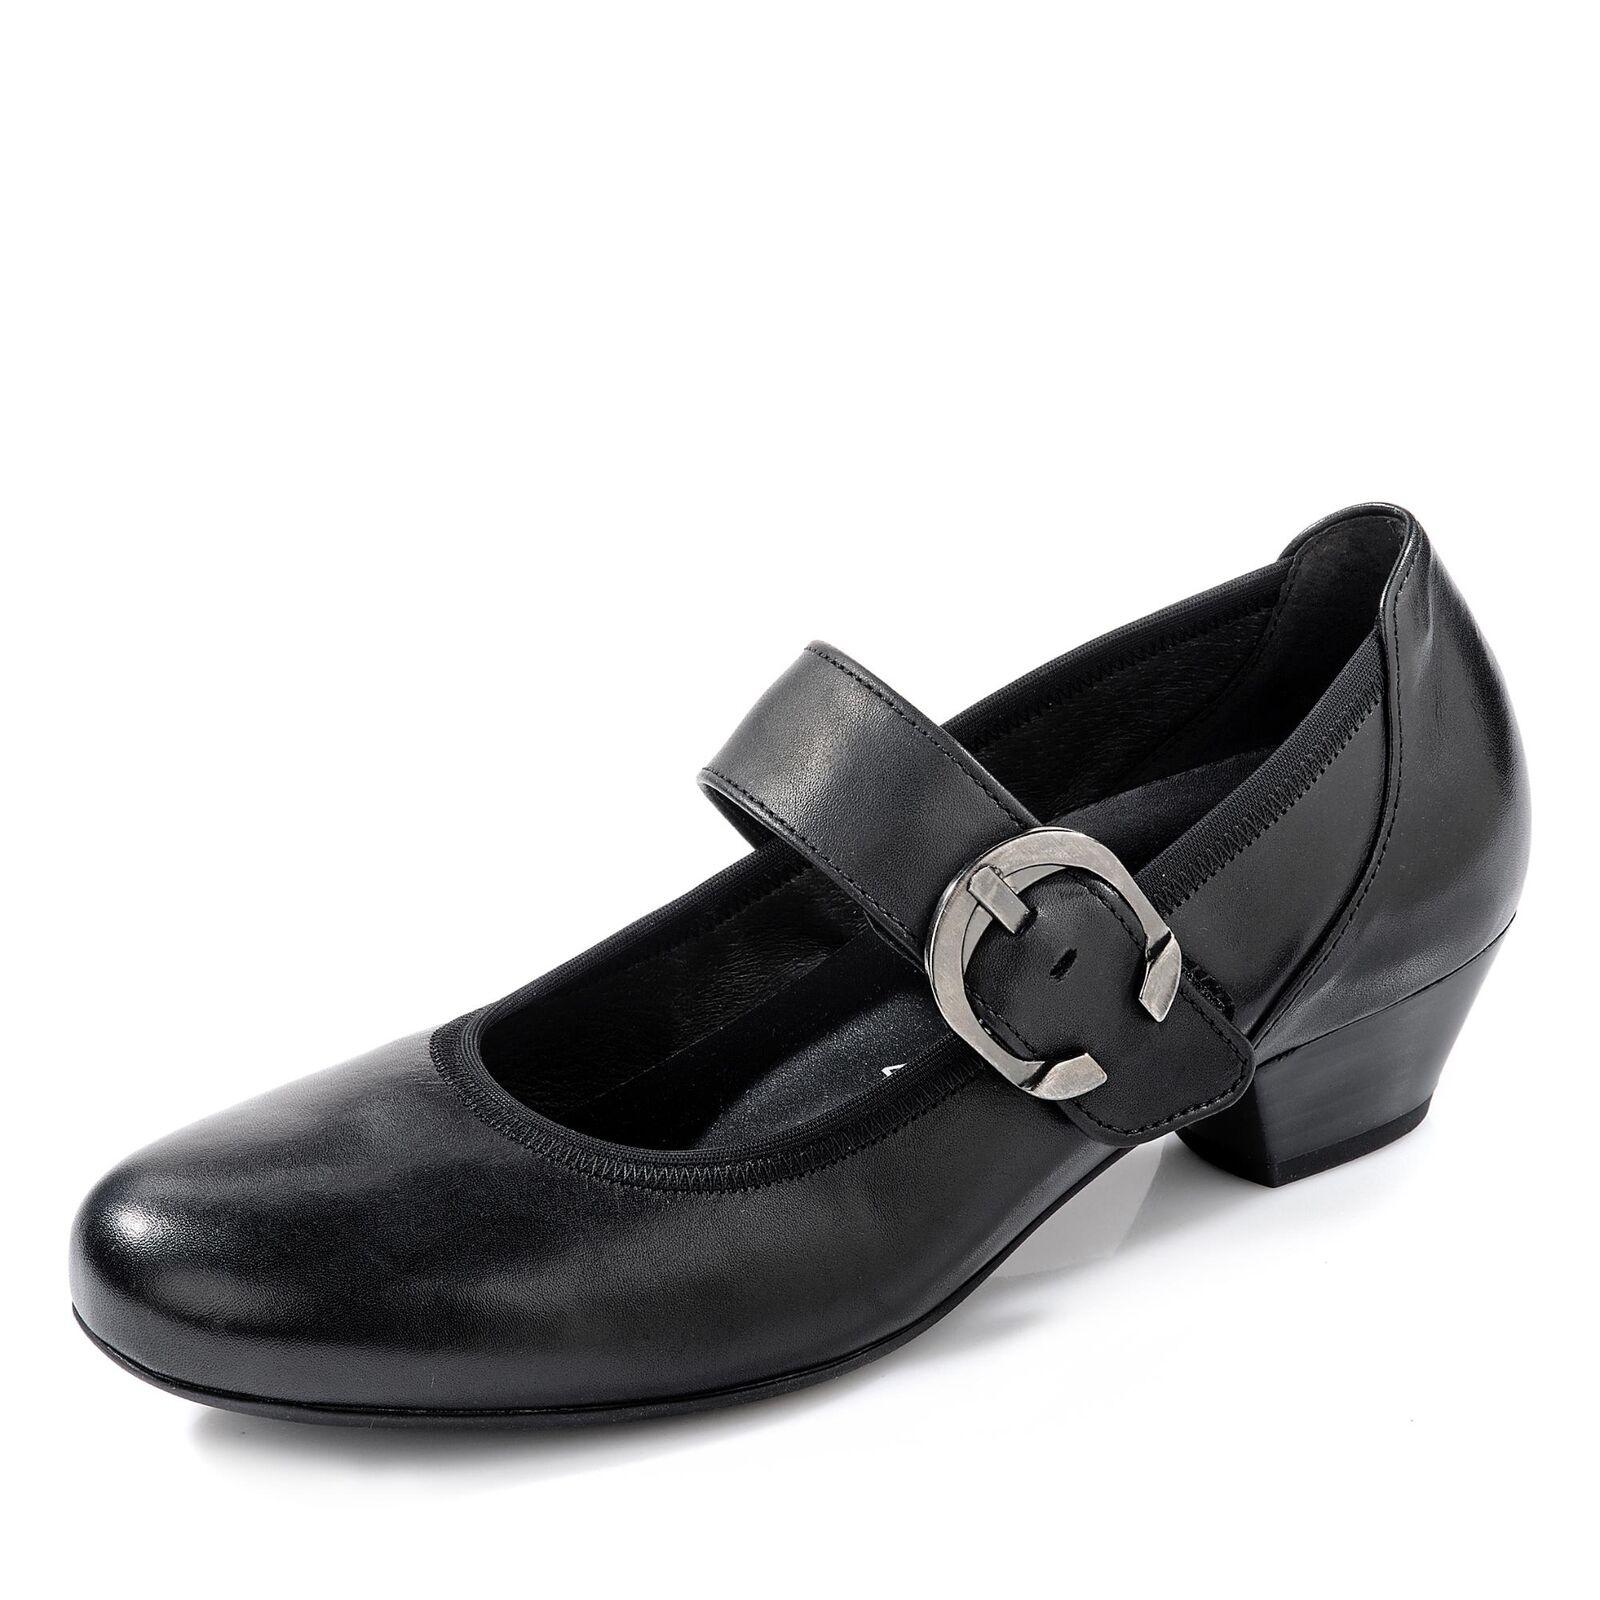 Rieker Damen Slipper Halbschuhe Schlupfschuhe Pantoletten Sommer Schuhe schwarz